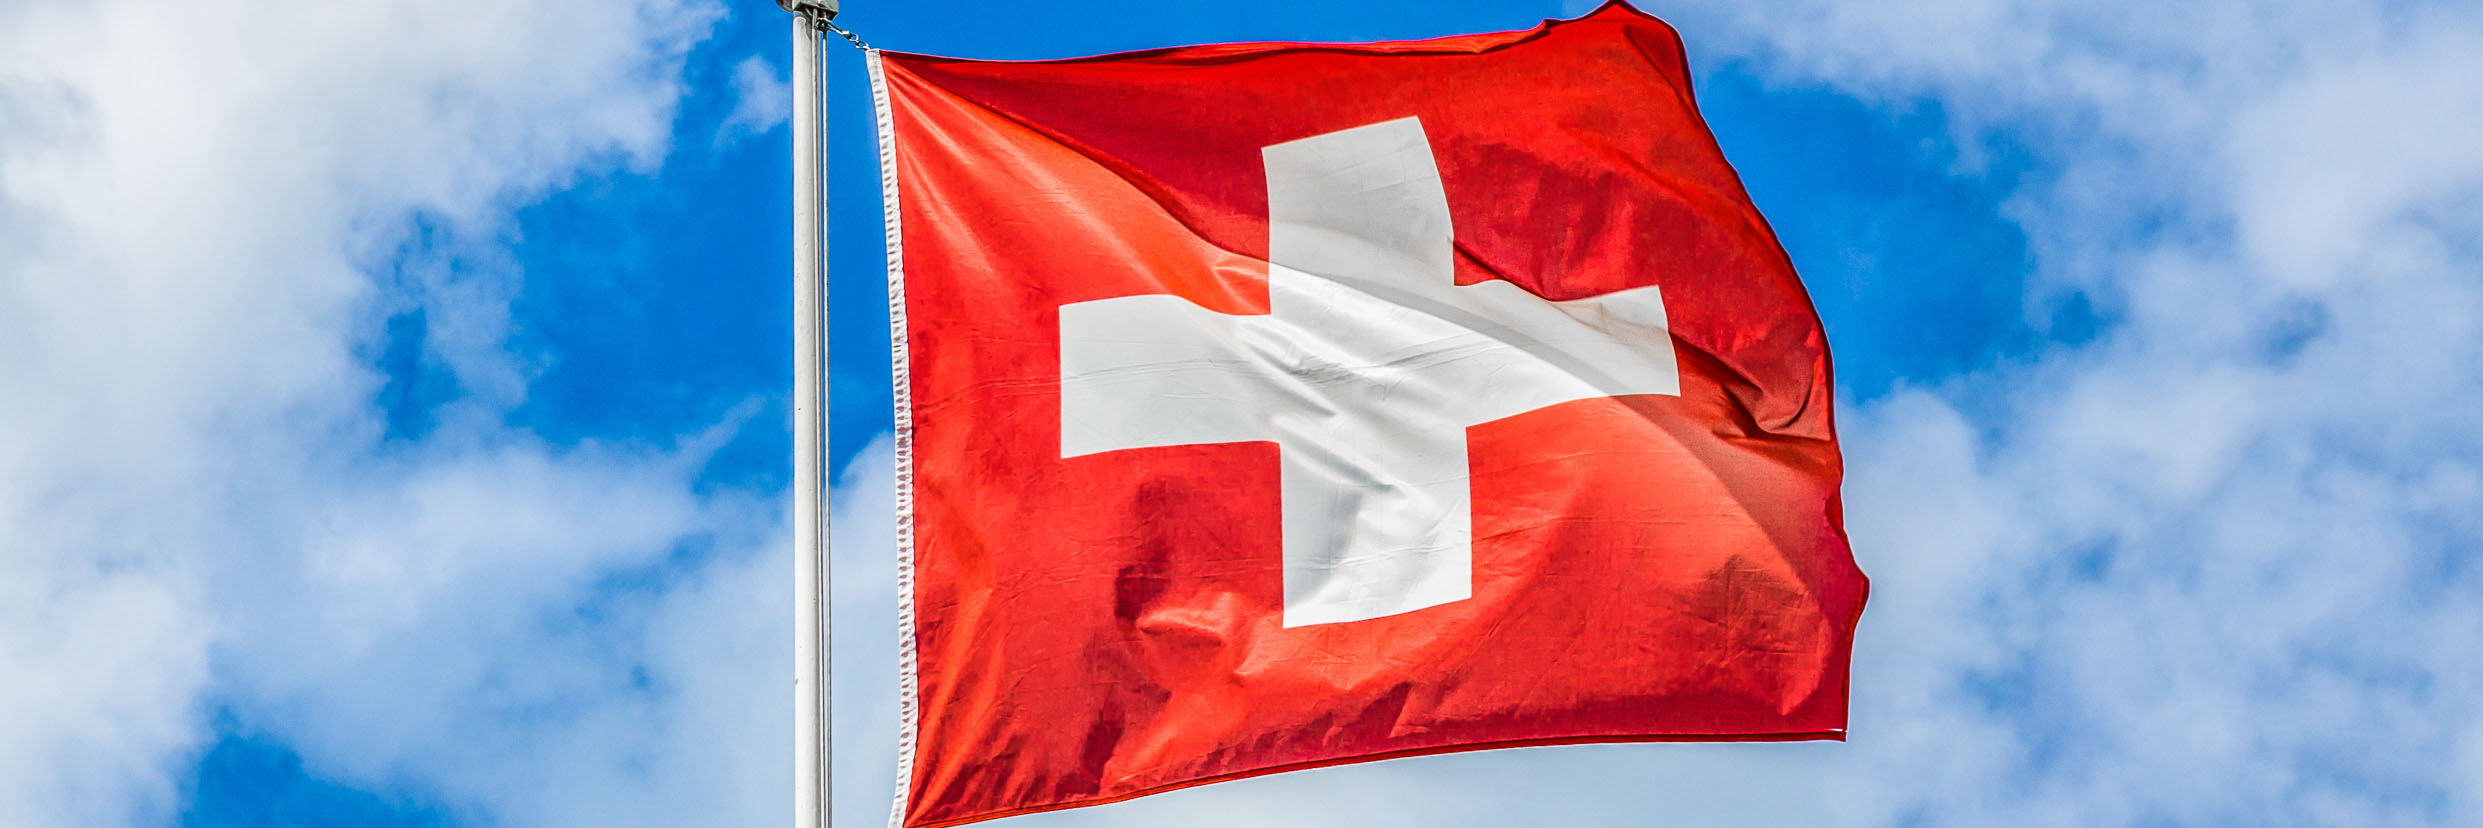 Chief Executive Domecq visits Switzerland